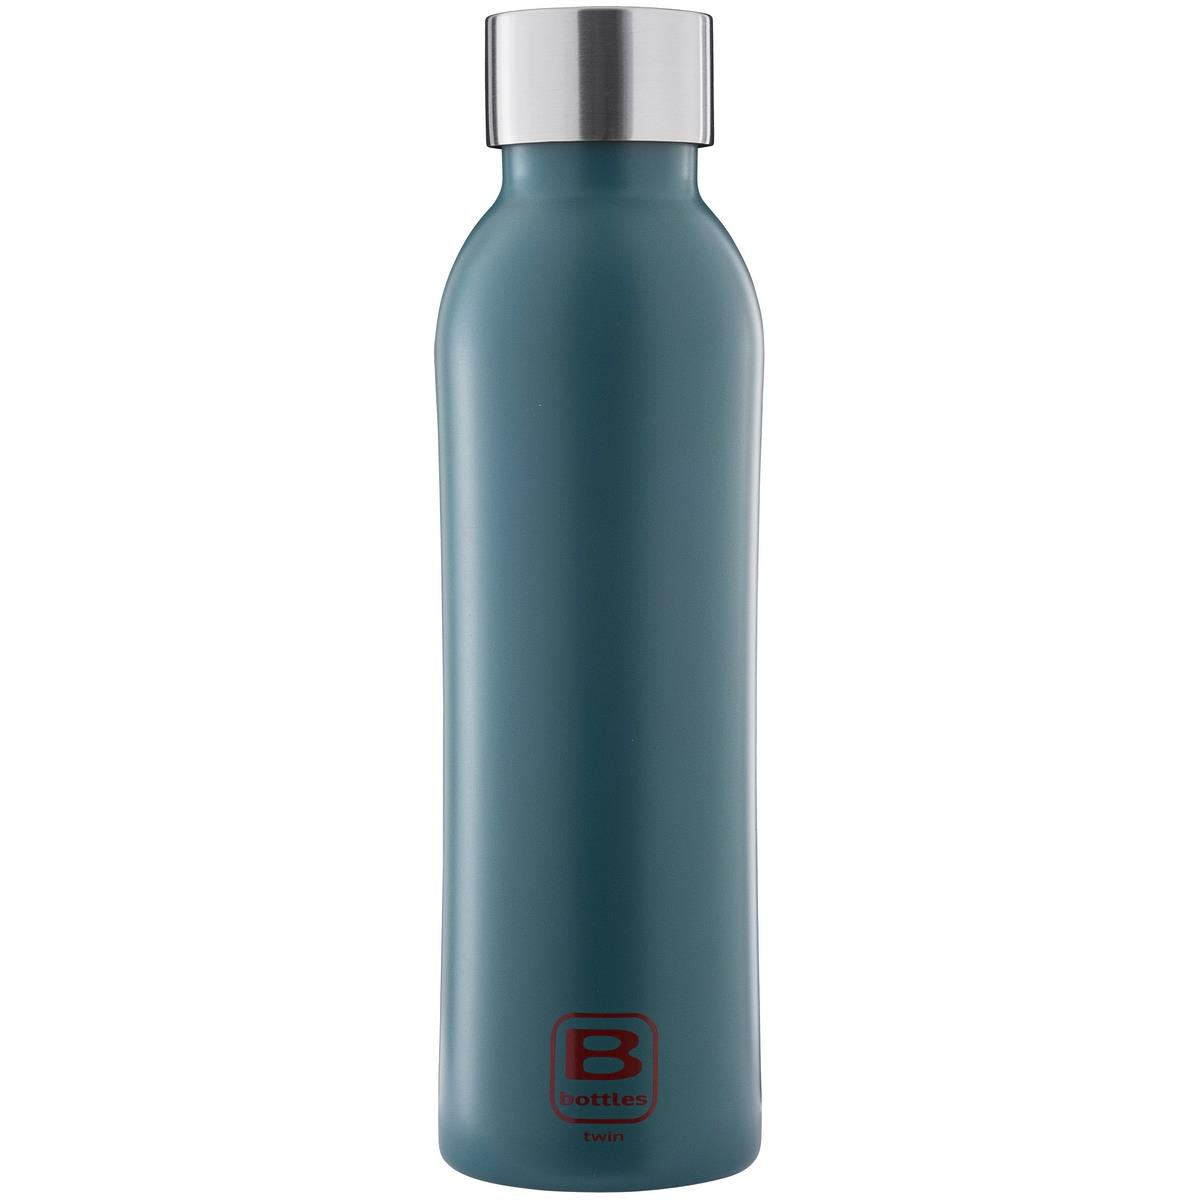 B Bottles Twin - Teal Blue - 500 ml - Bottiglia Termica a doppia parete in acciaio inox 18/10